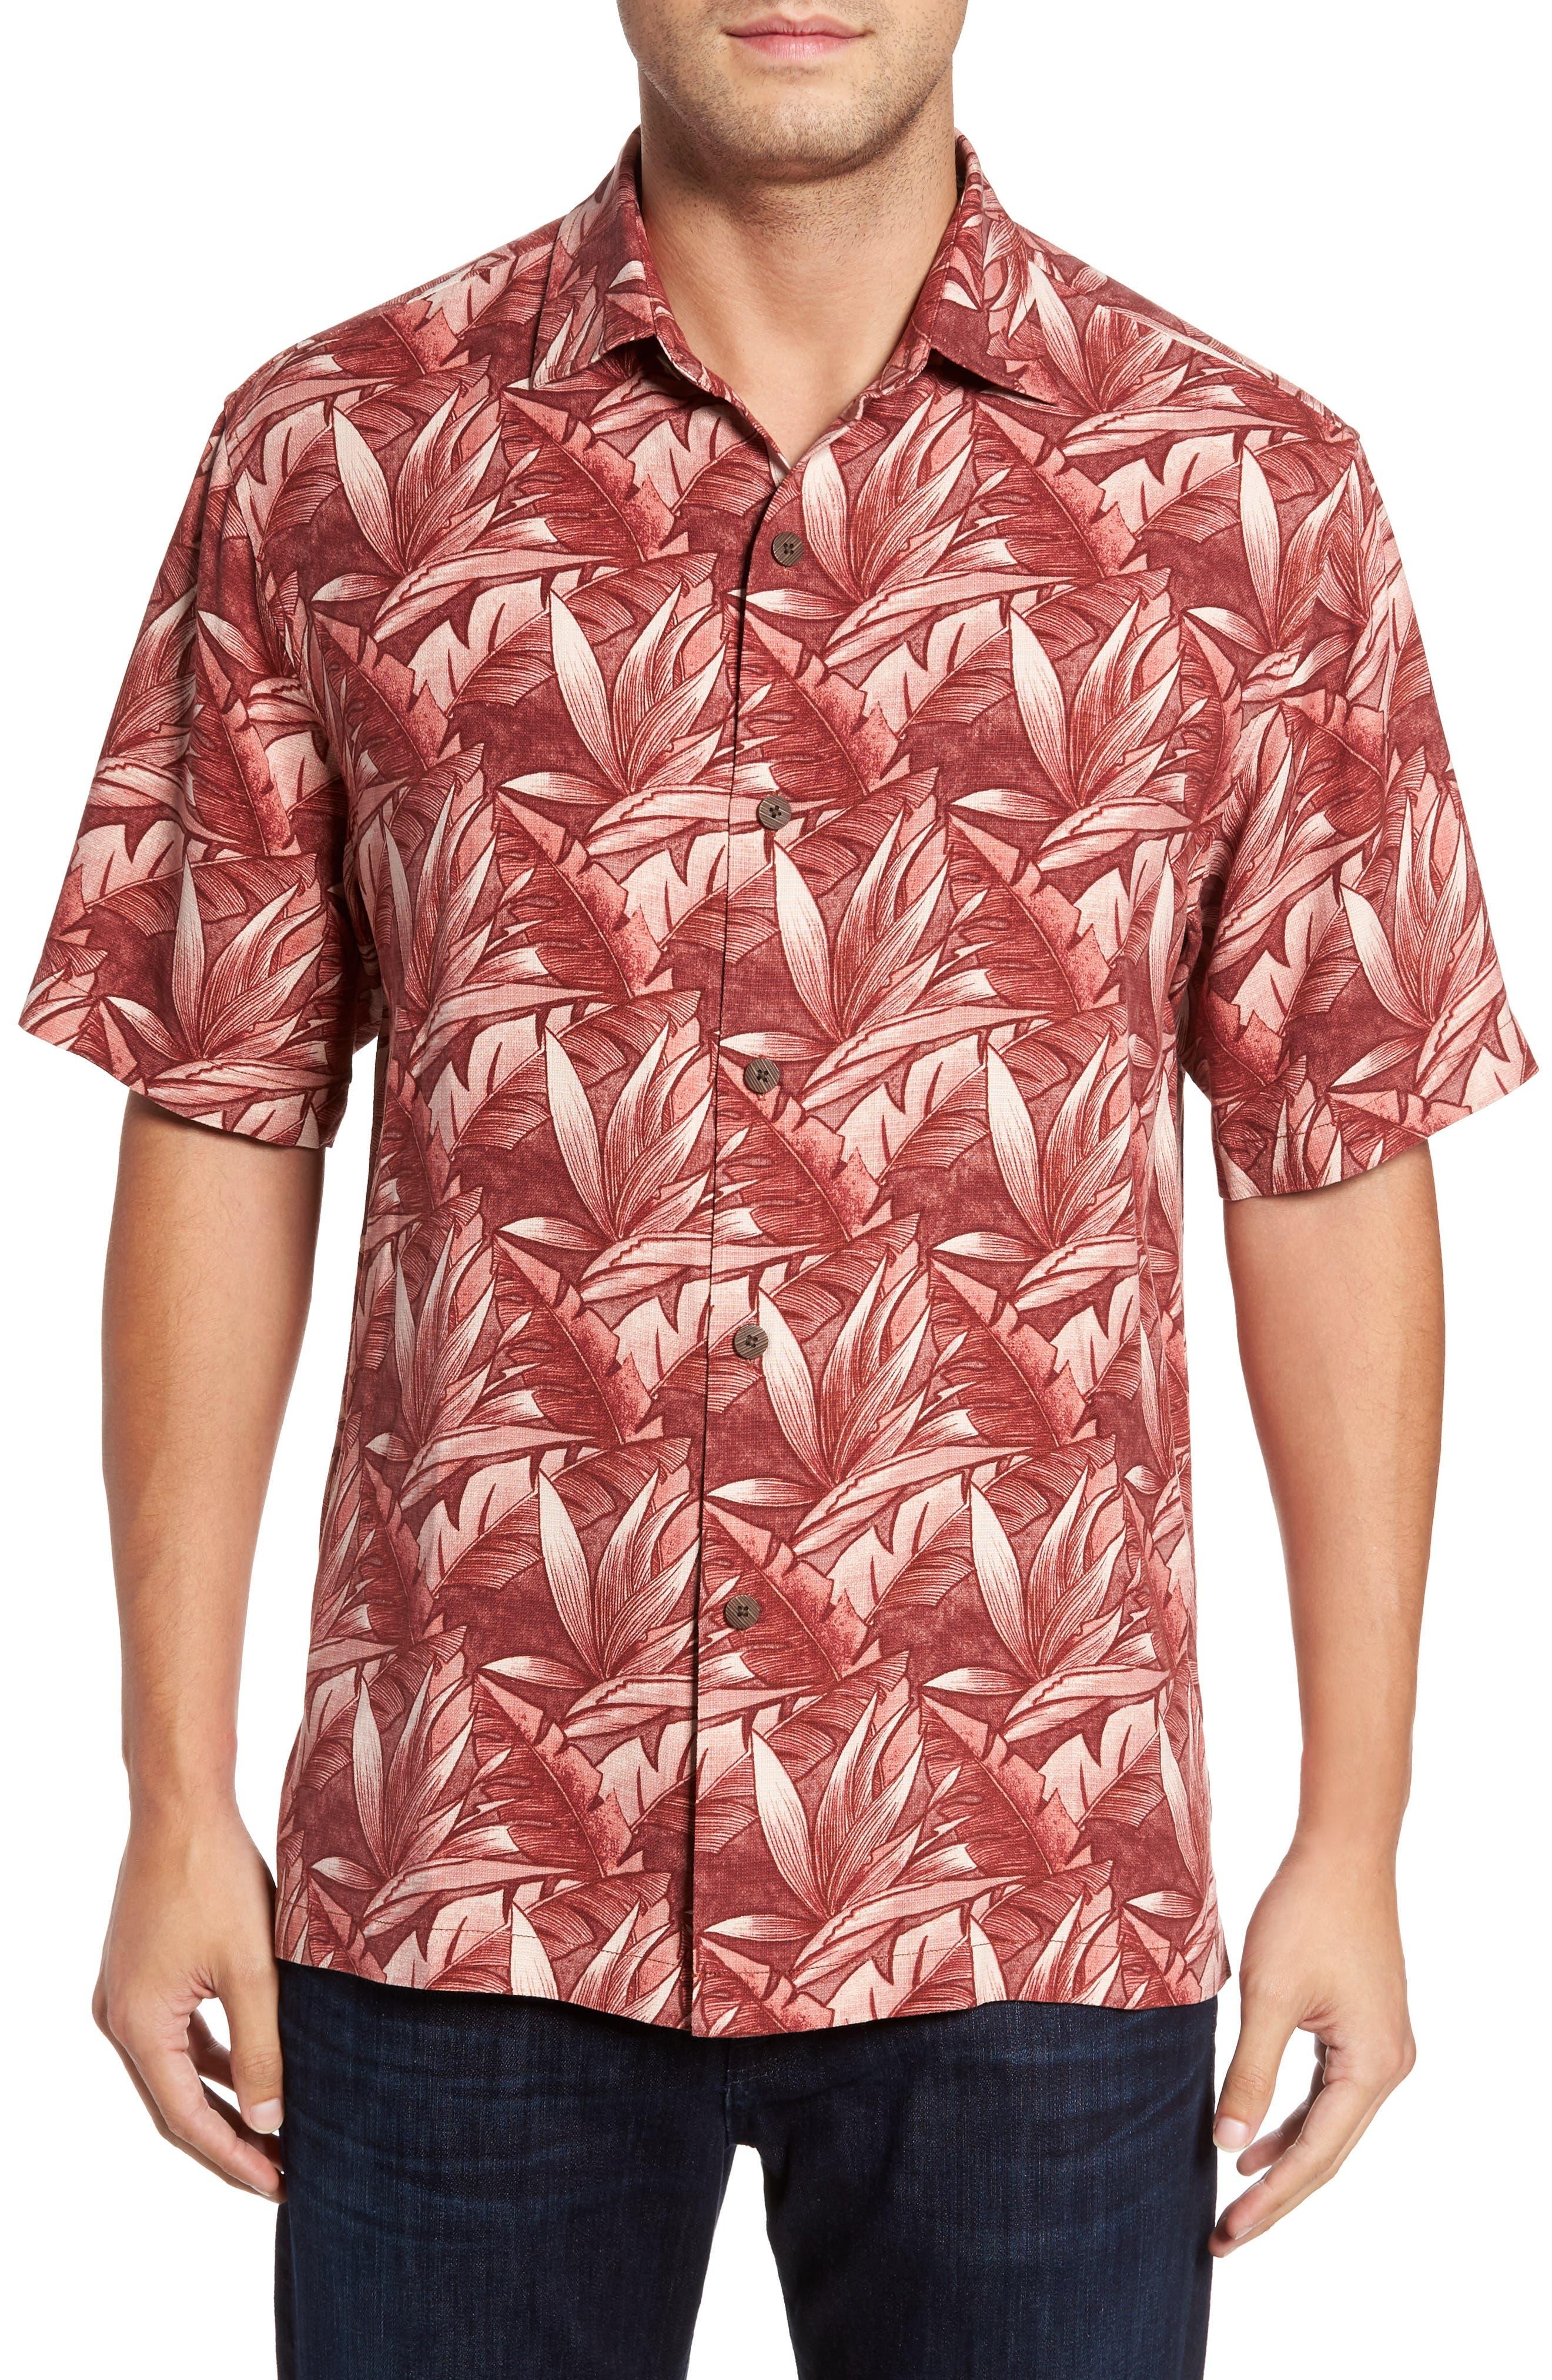 Alternate Image 1 Selected - Tommy Bahama Jema Fronds Silk Camp Shirt